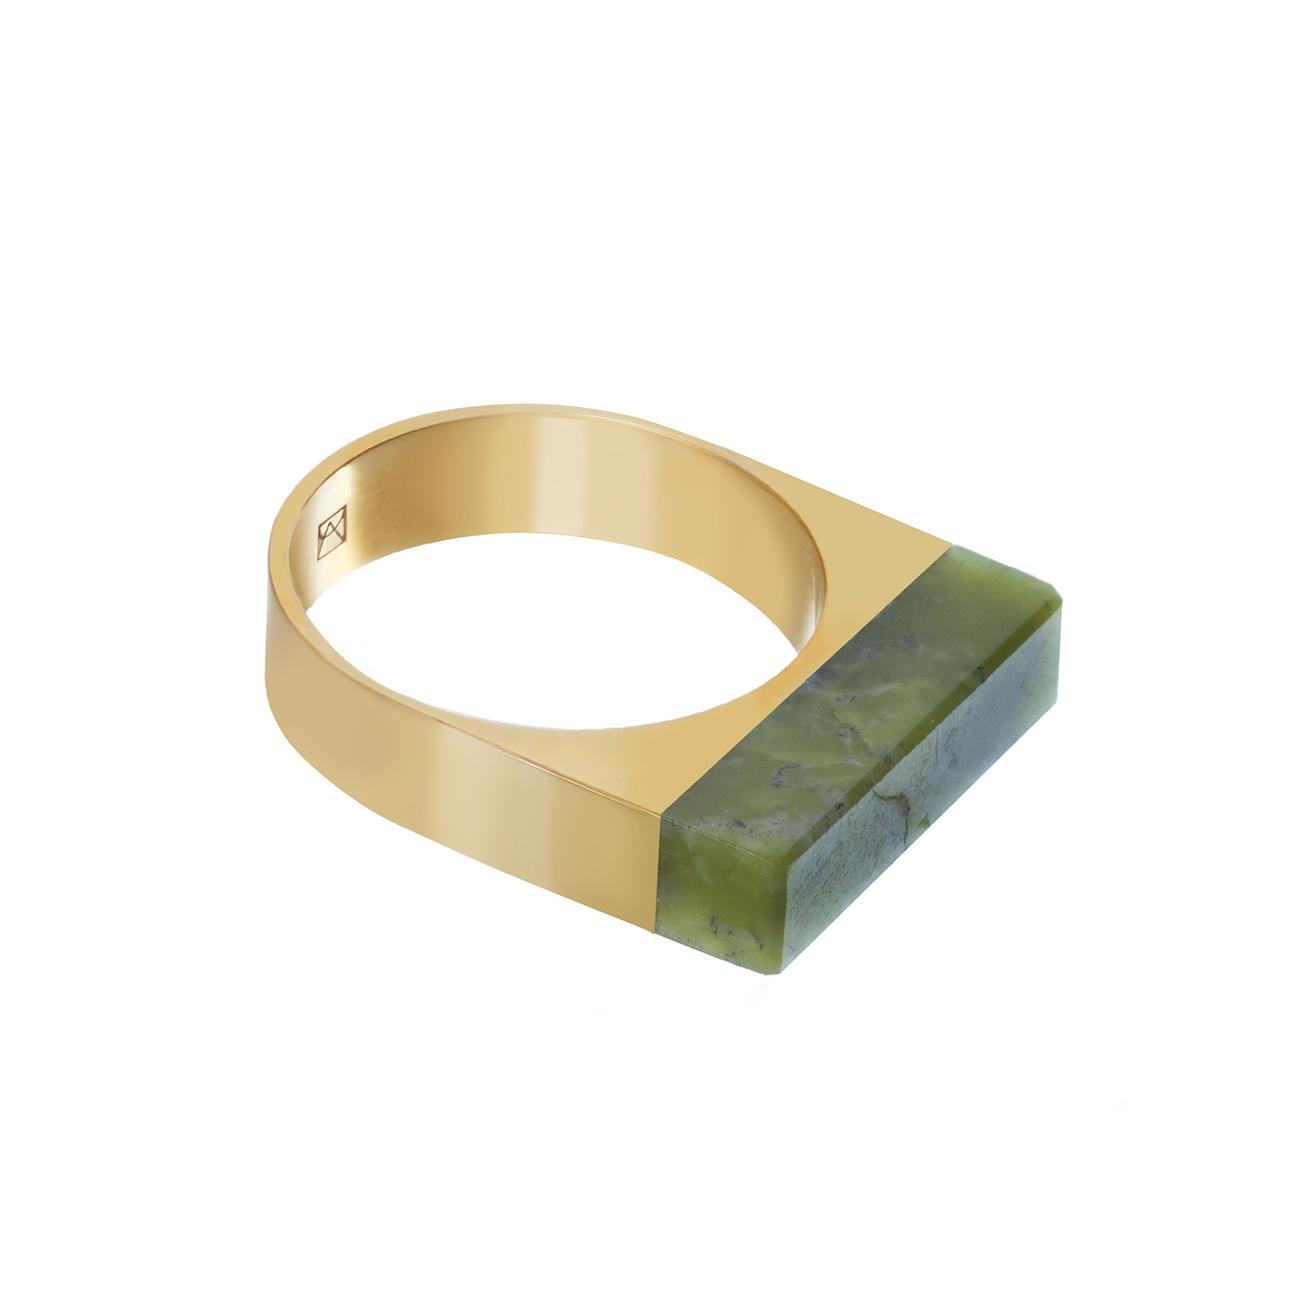 metaformi_design_jewelry_split_ring_jade_